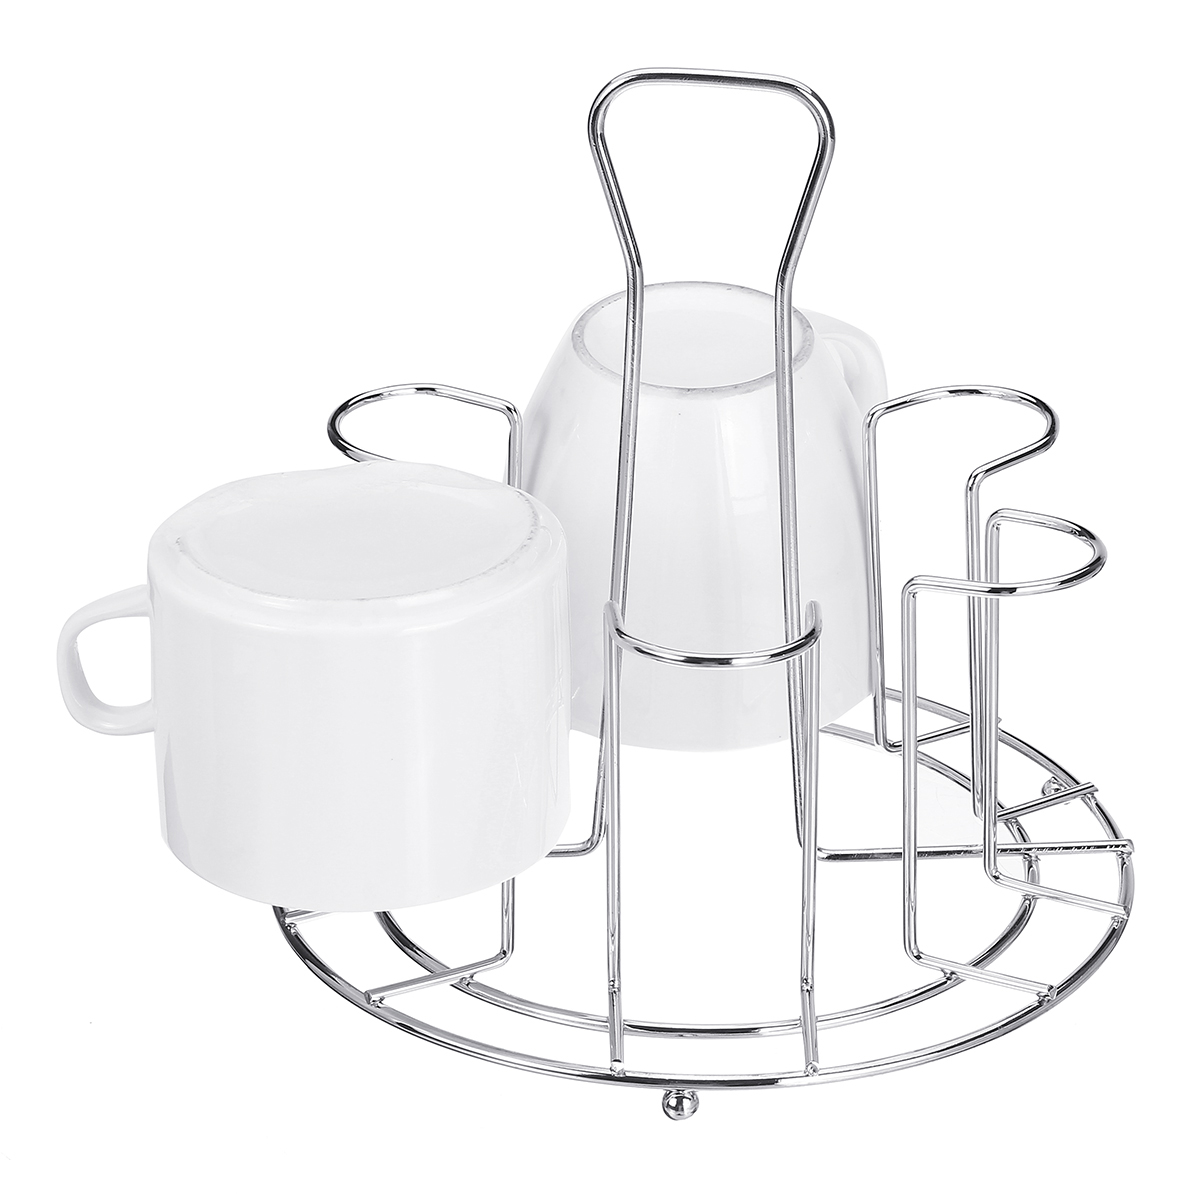 6 Mug Tree Holder Countertop Mug Tree Stand Metal Mug Holder For Home Kitchen Tea Coffee Cup Accessory Kitchen Organizer Walmart Canada